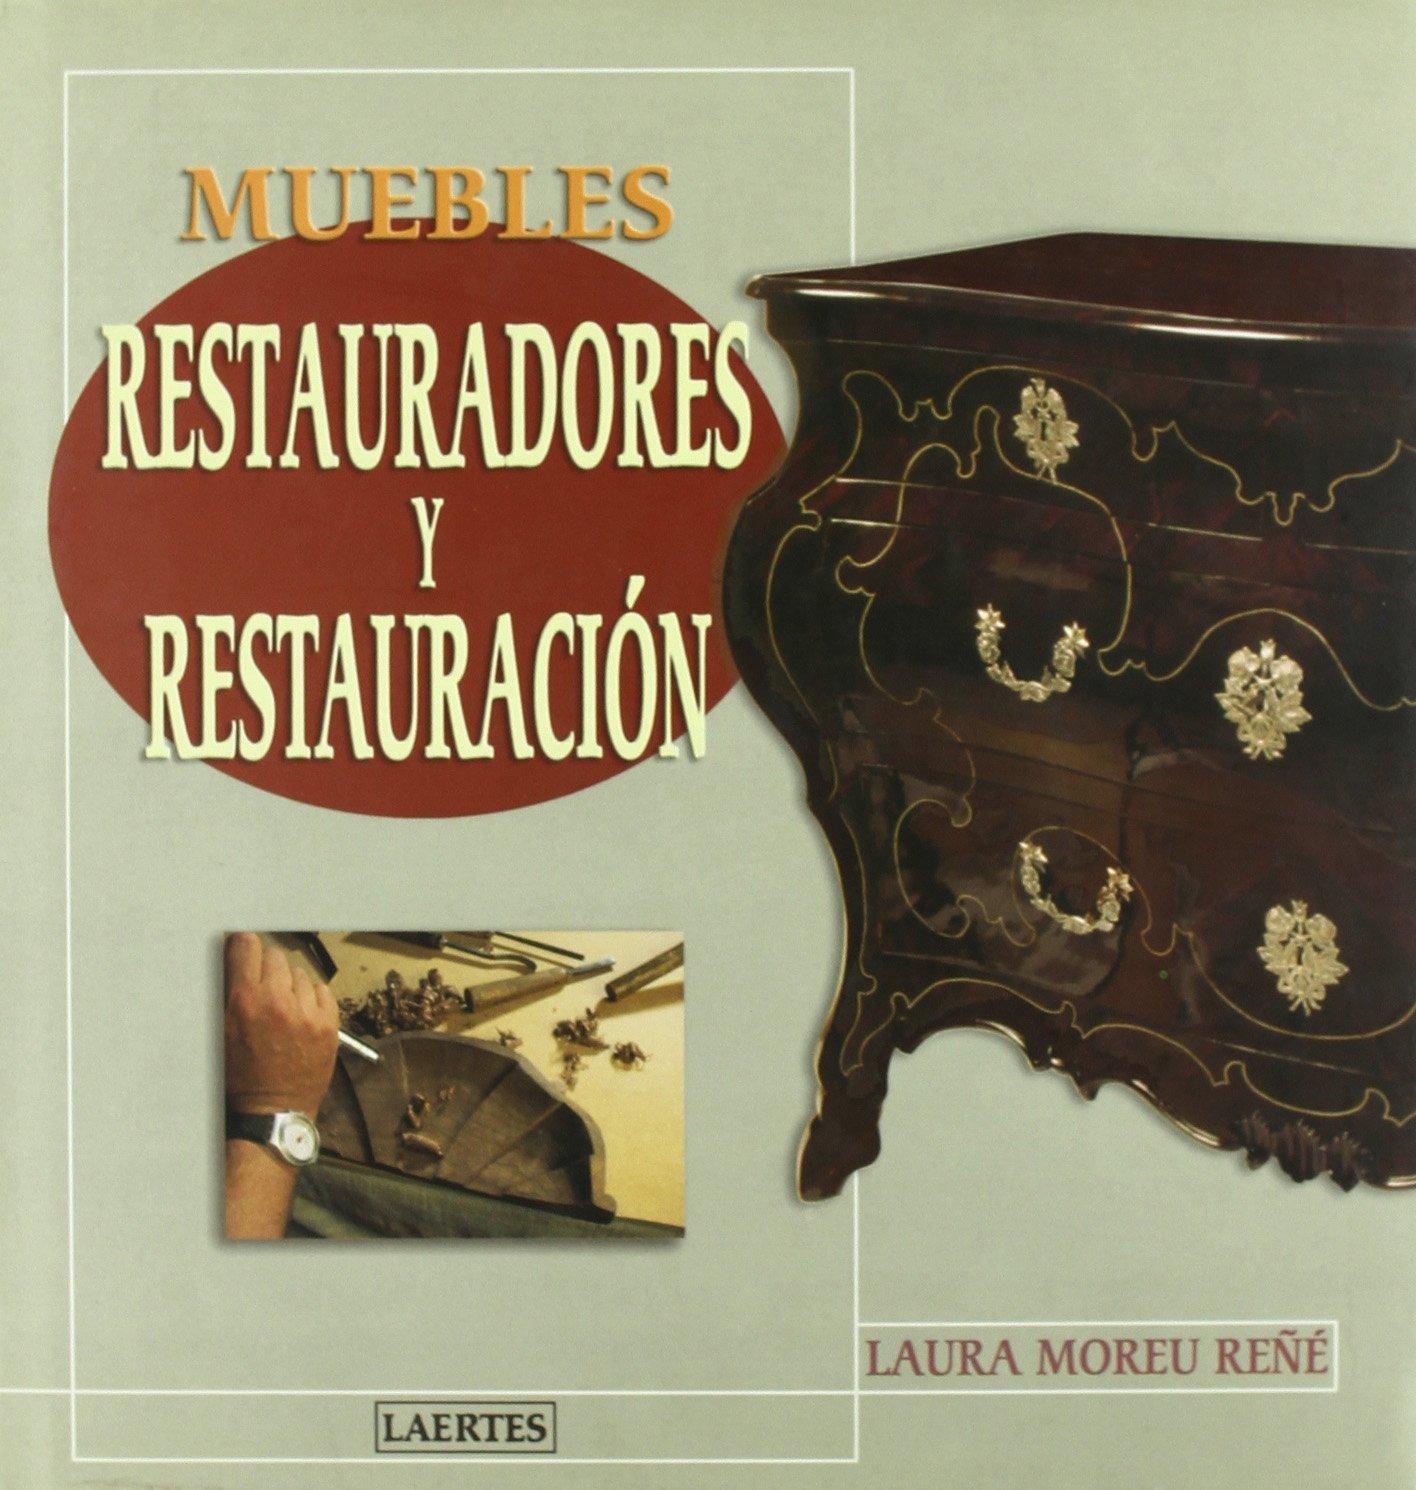 Muebles. Restauradores y restauración (Laertes) Tapa dura – 1 oct 2002 Laura Moreu Reñé Josep M. Moreu Reñé Laertes editorial S.L.